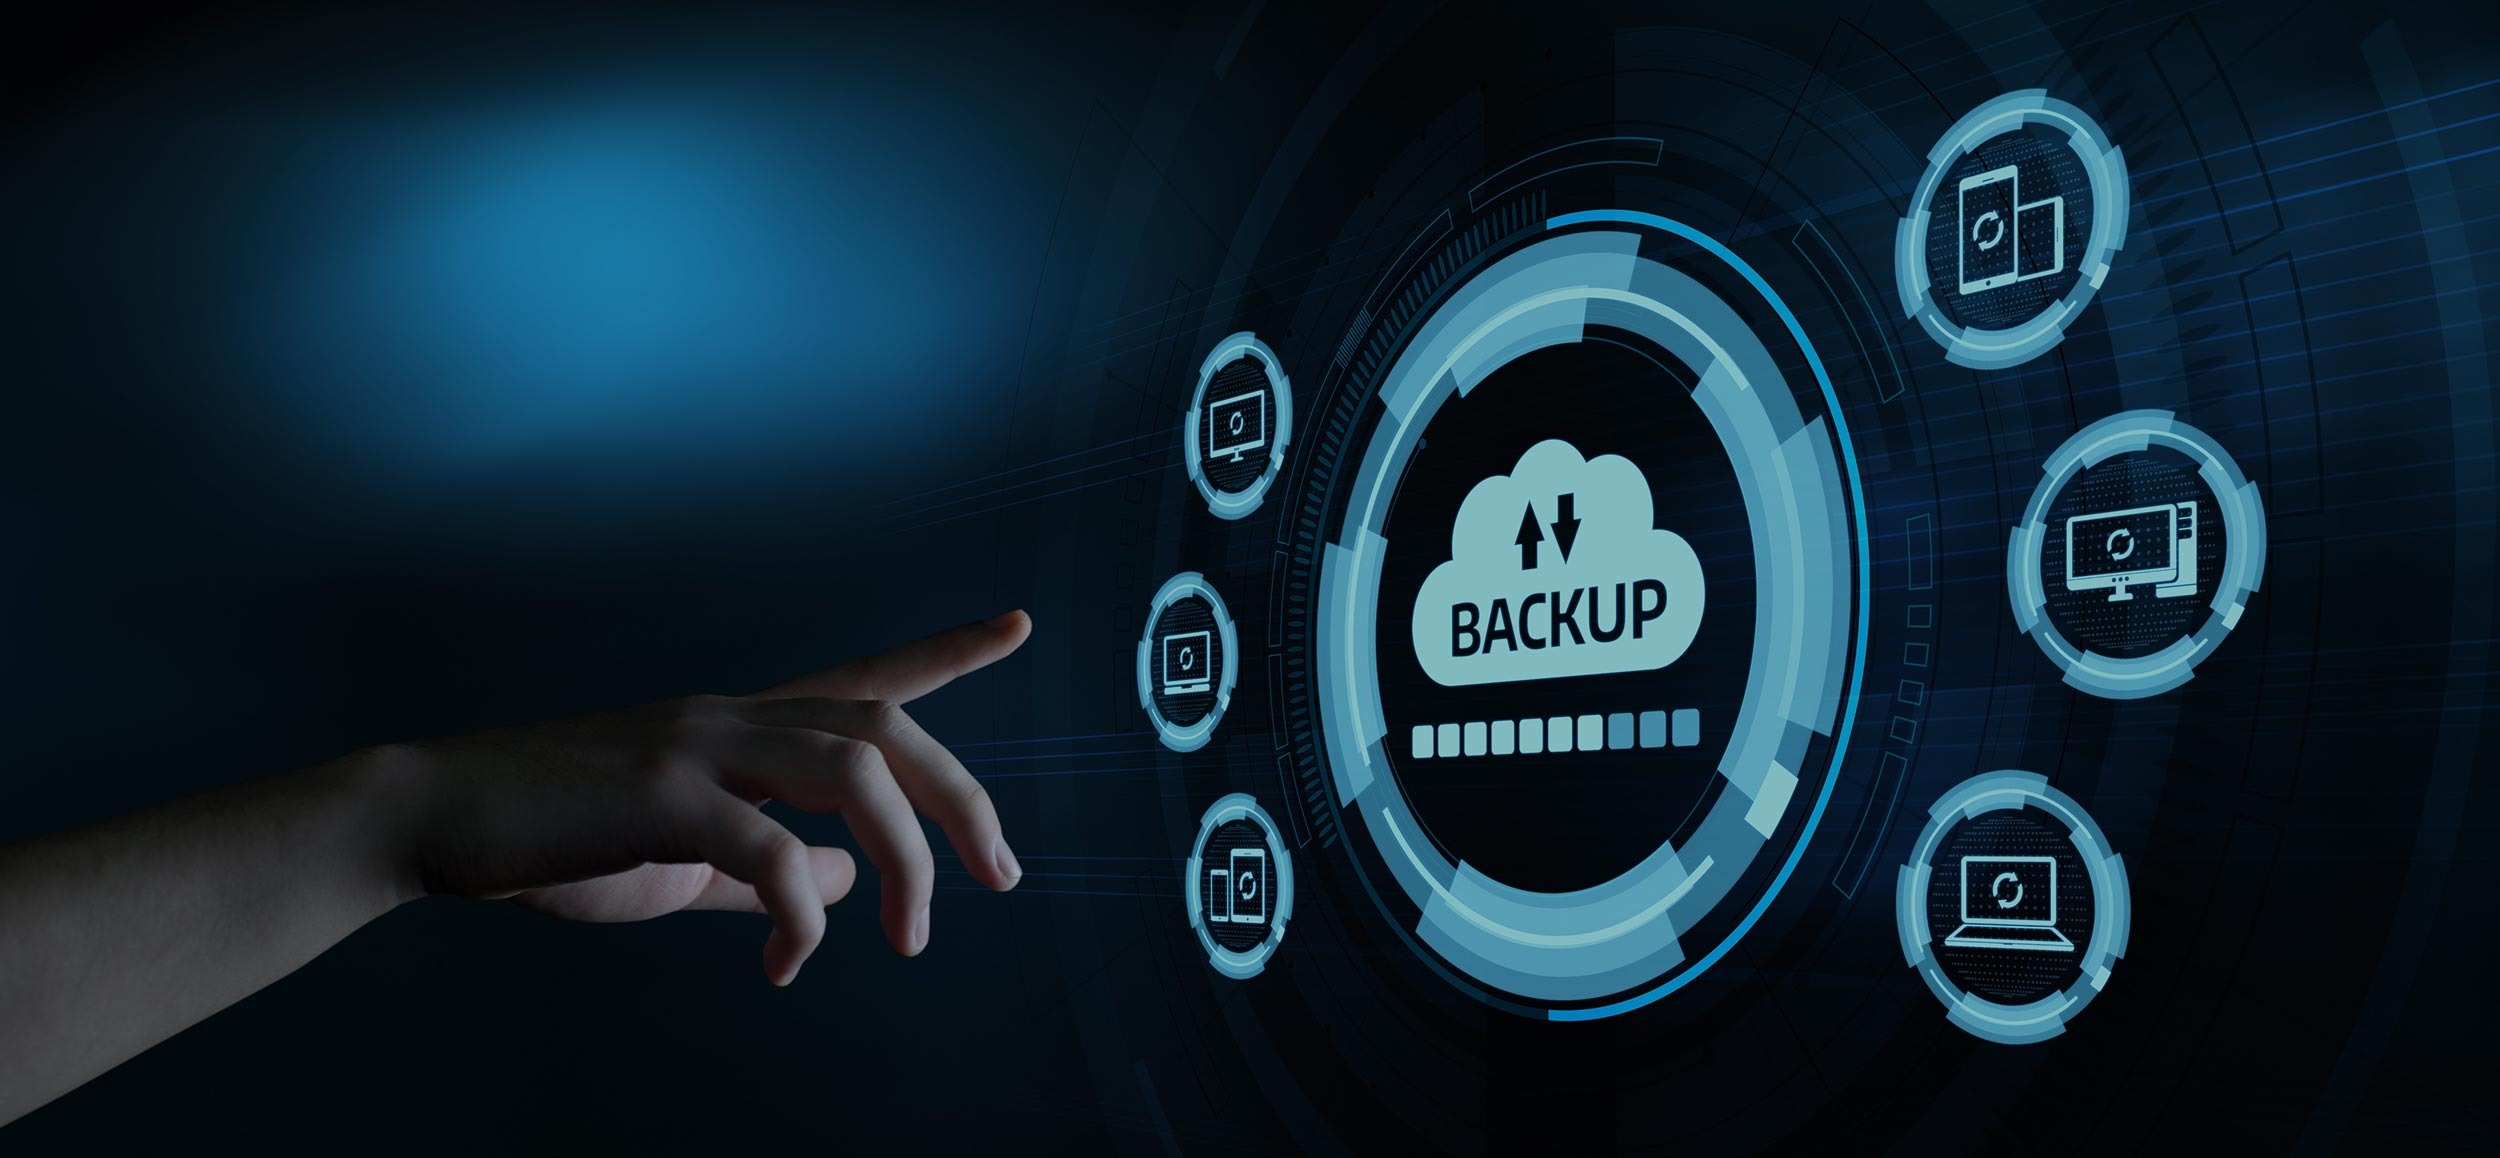 infoguard-blog-warum-backup